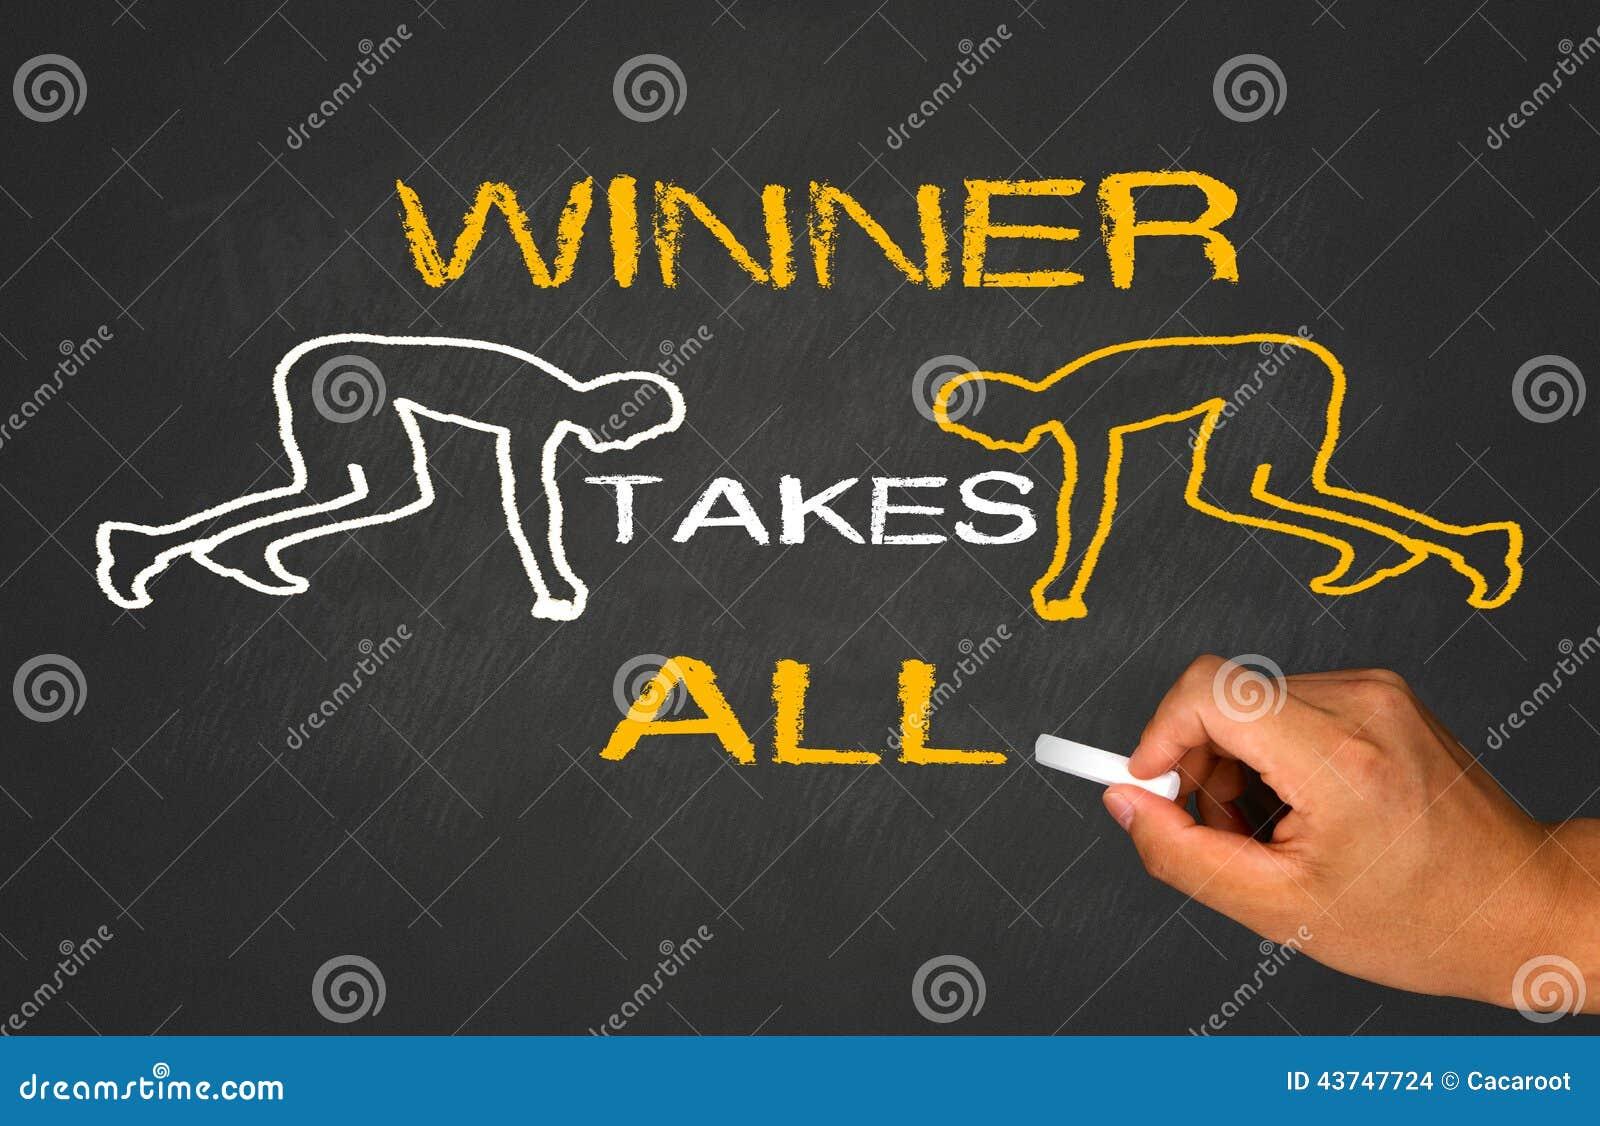 Sammy Hagar - Winner takes it all Lyrics